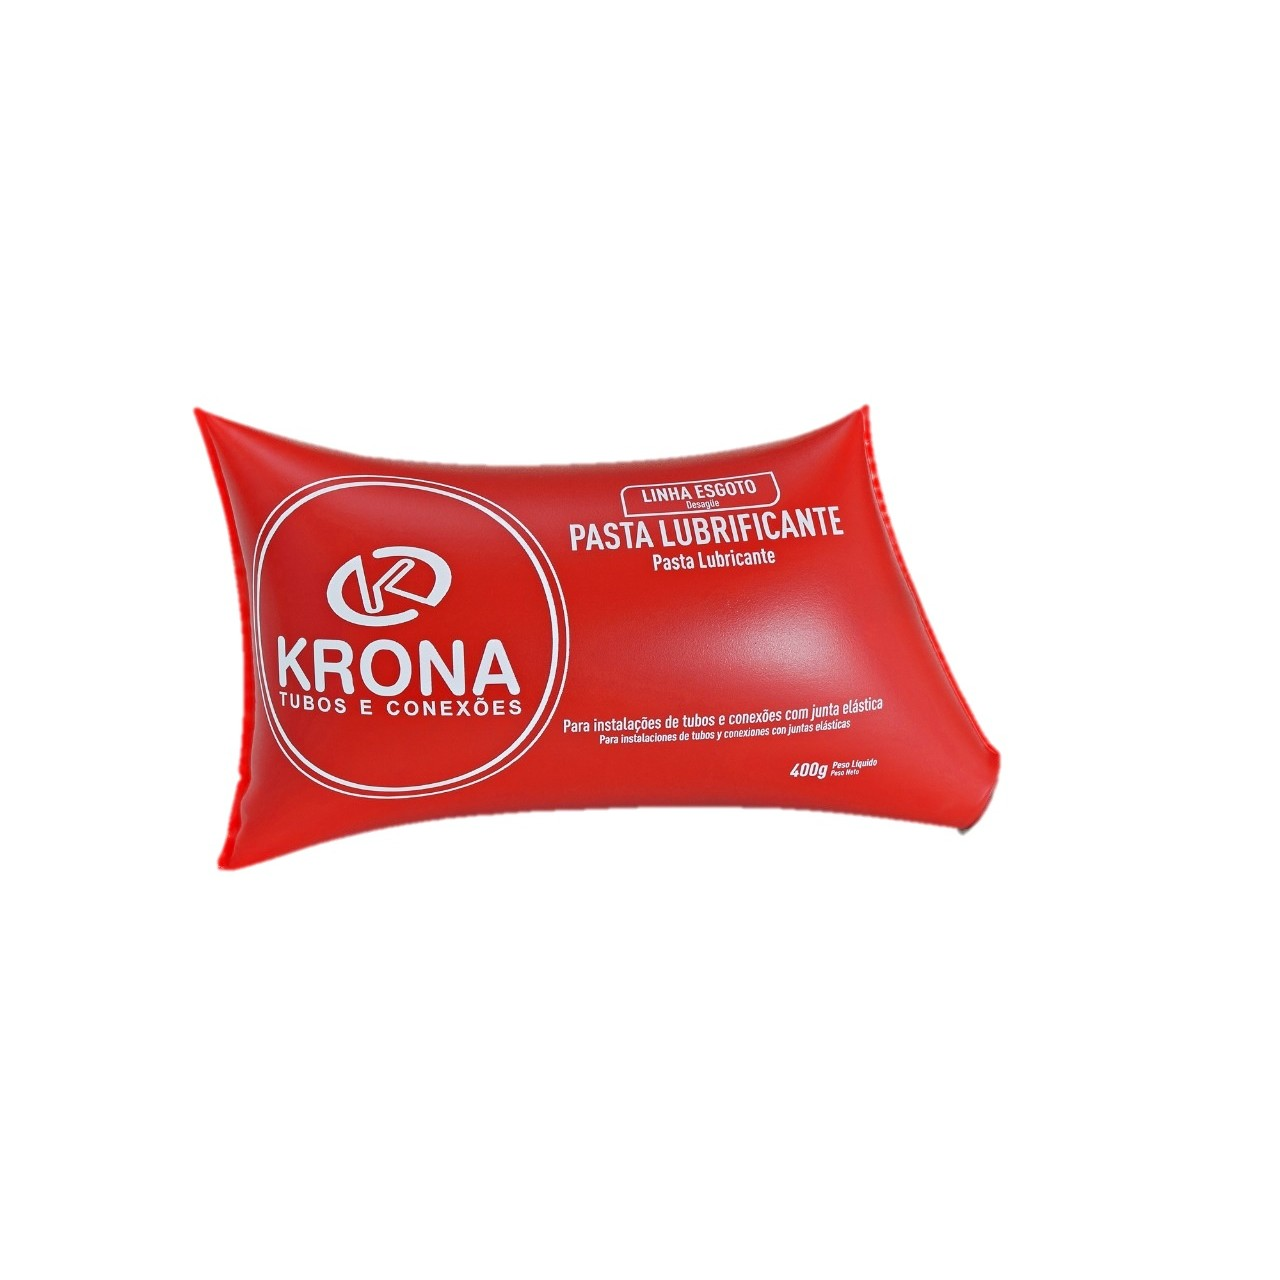 Pasta para Lubrificacao 400g - Krona